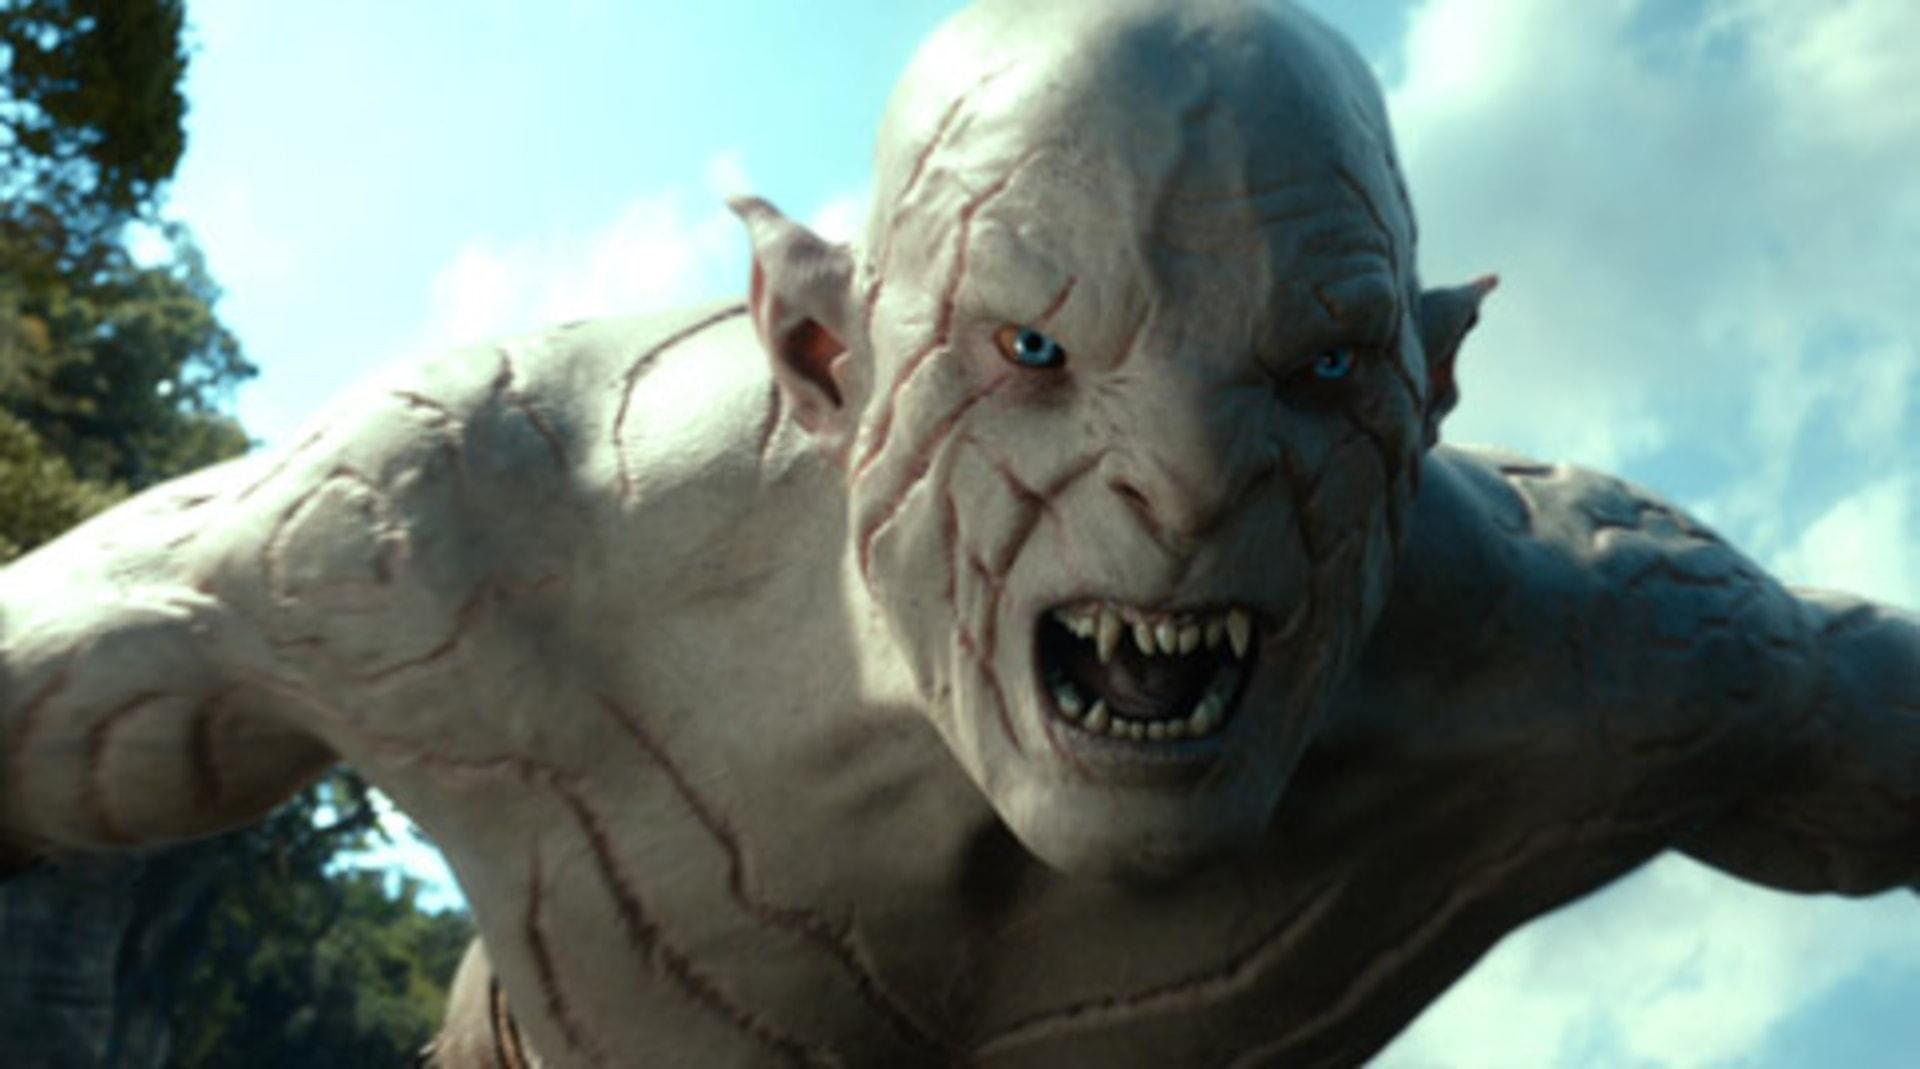 The Hobbit: The Desolation of Smaug - Image 30